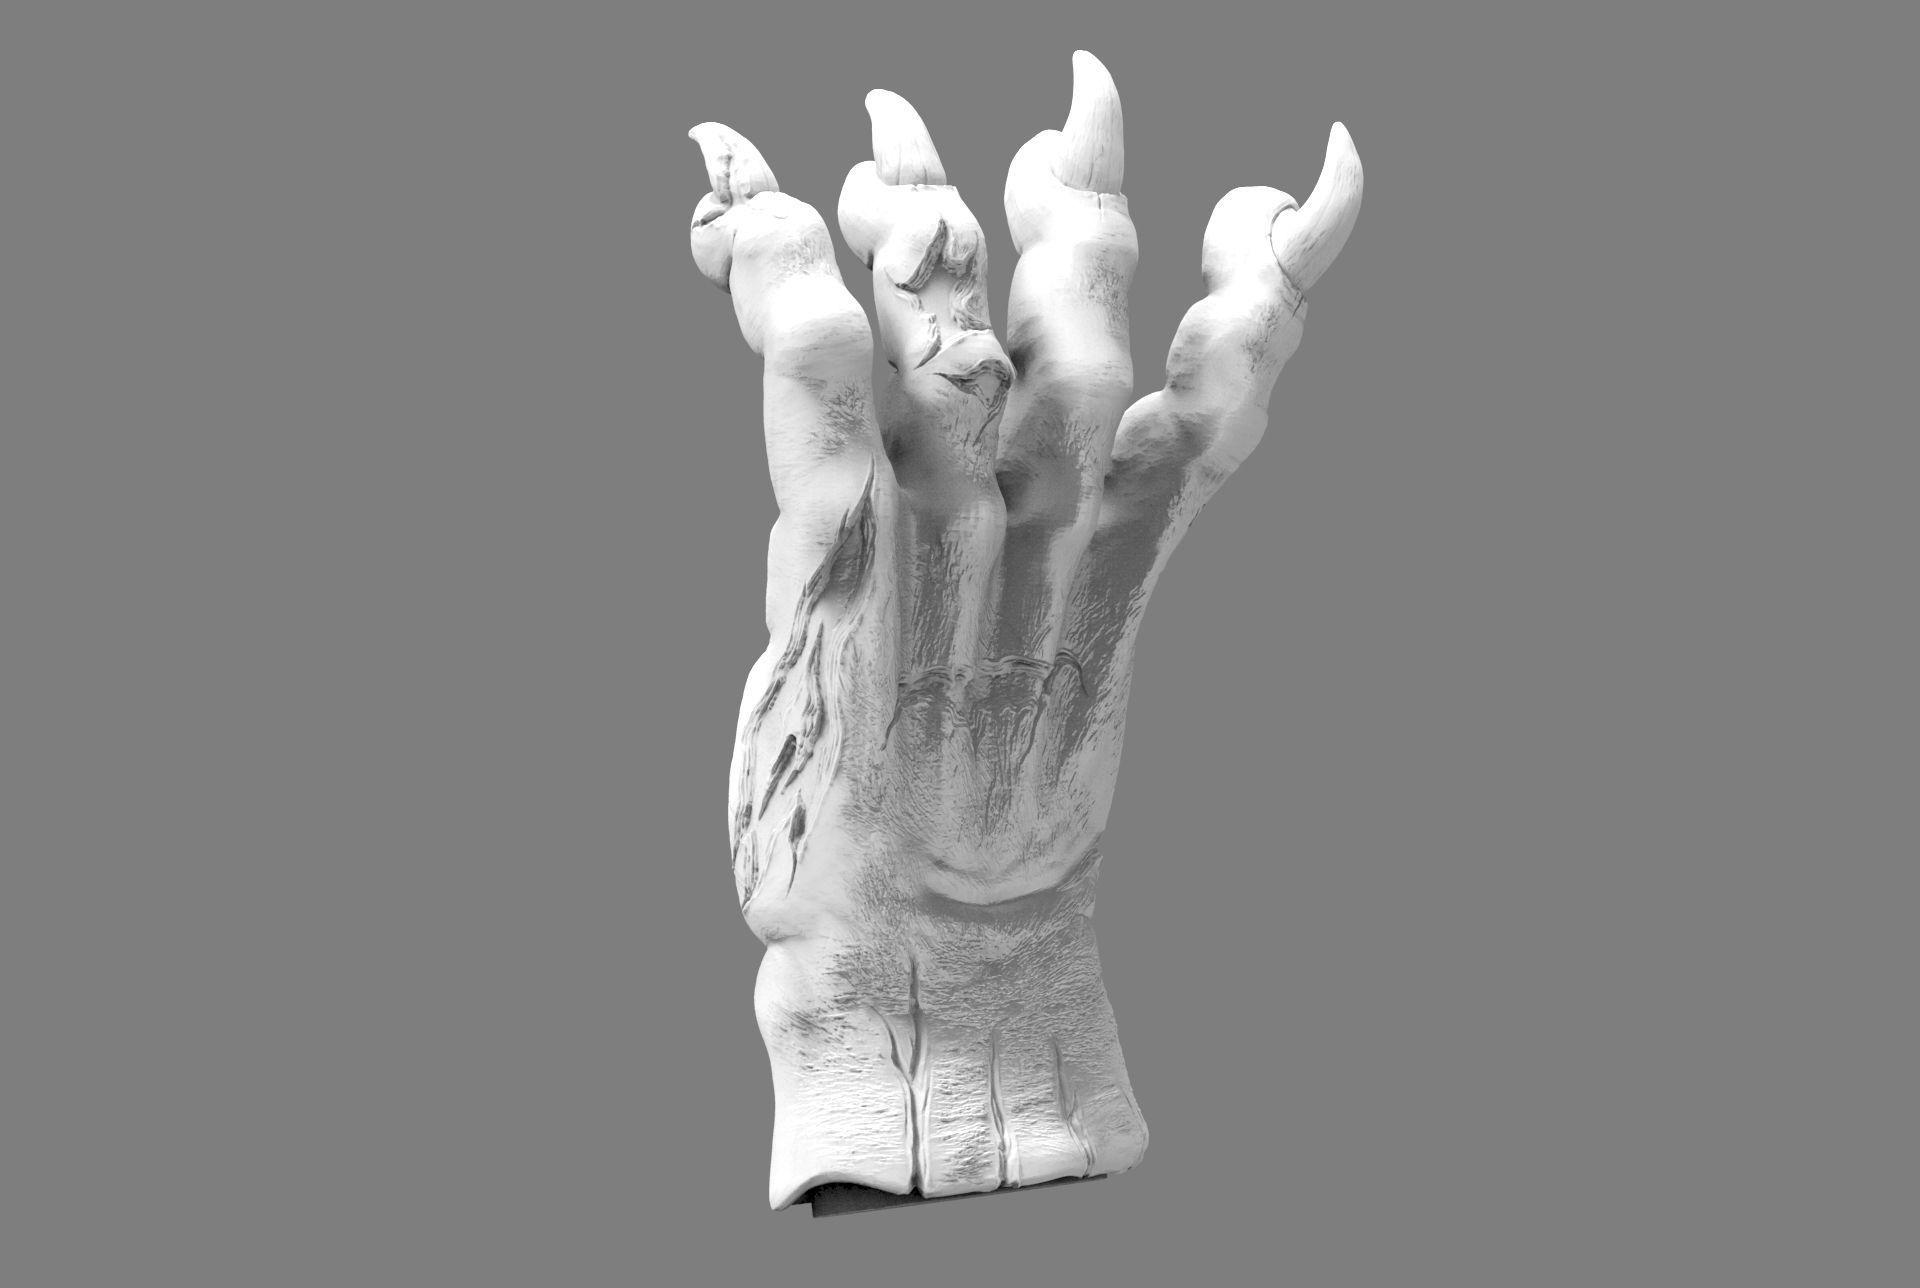 demon beast hand